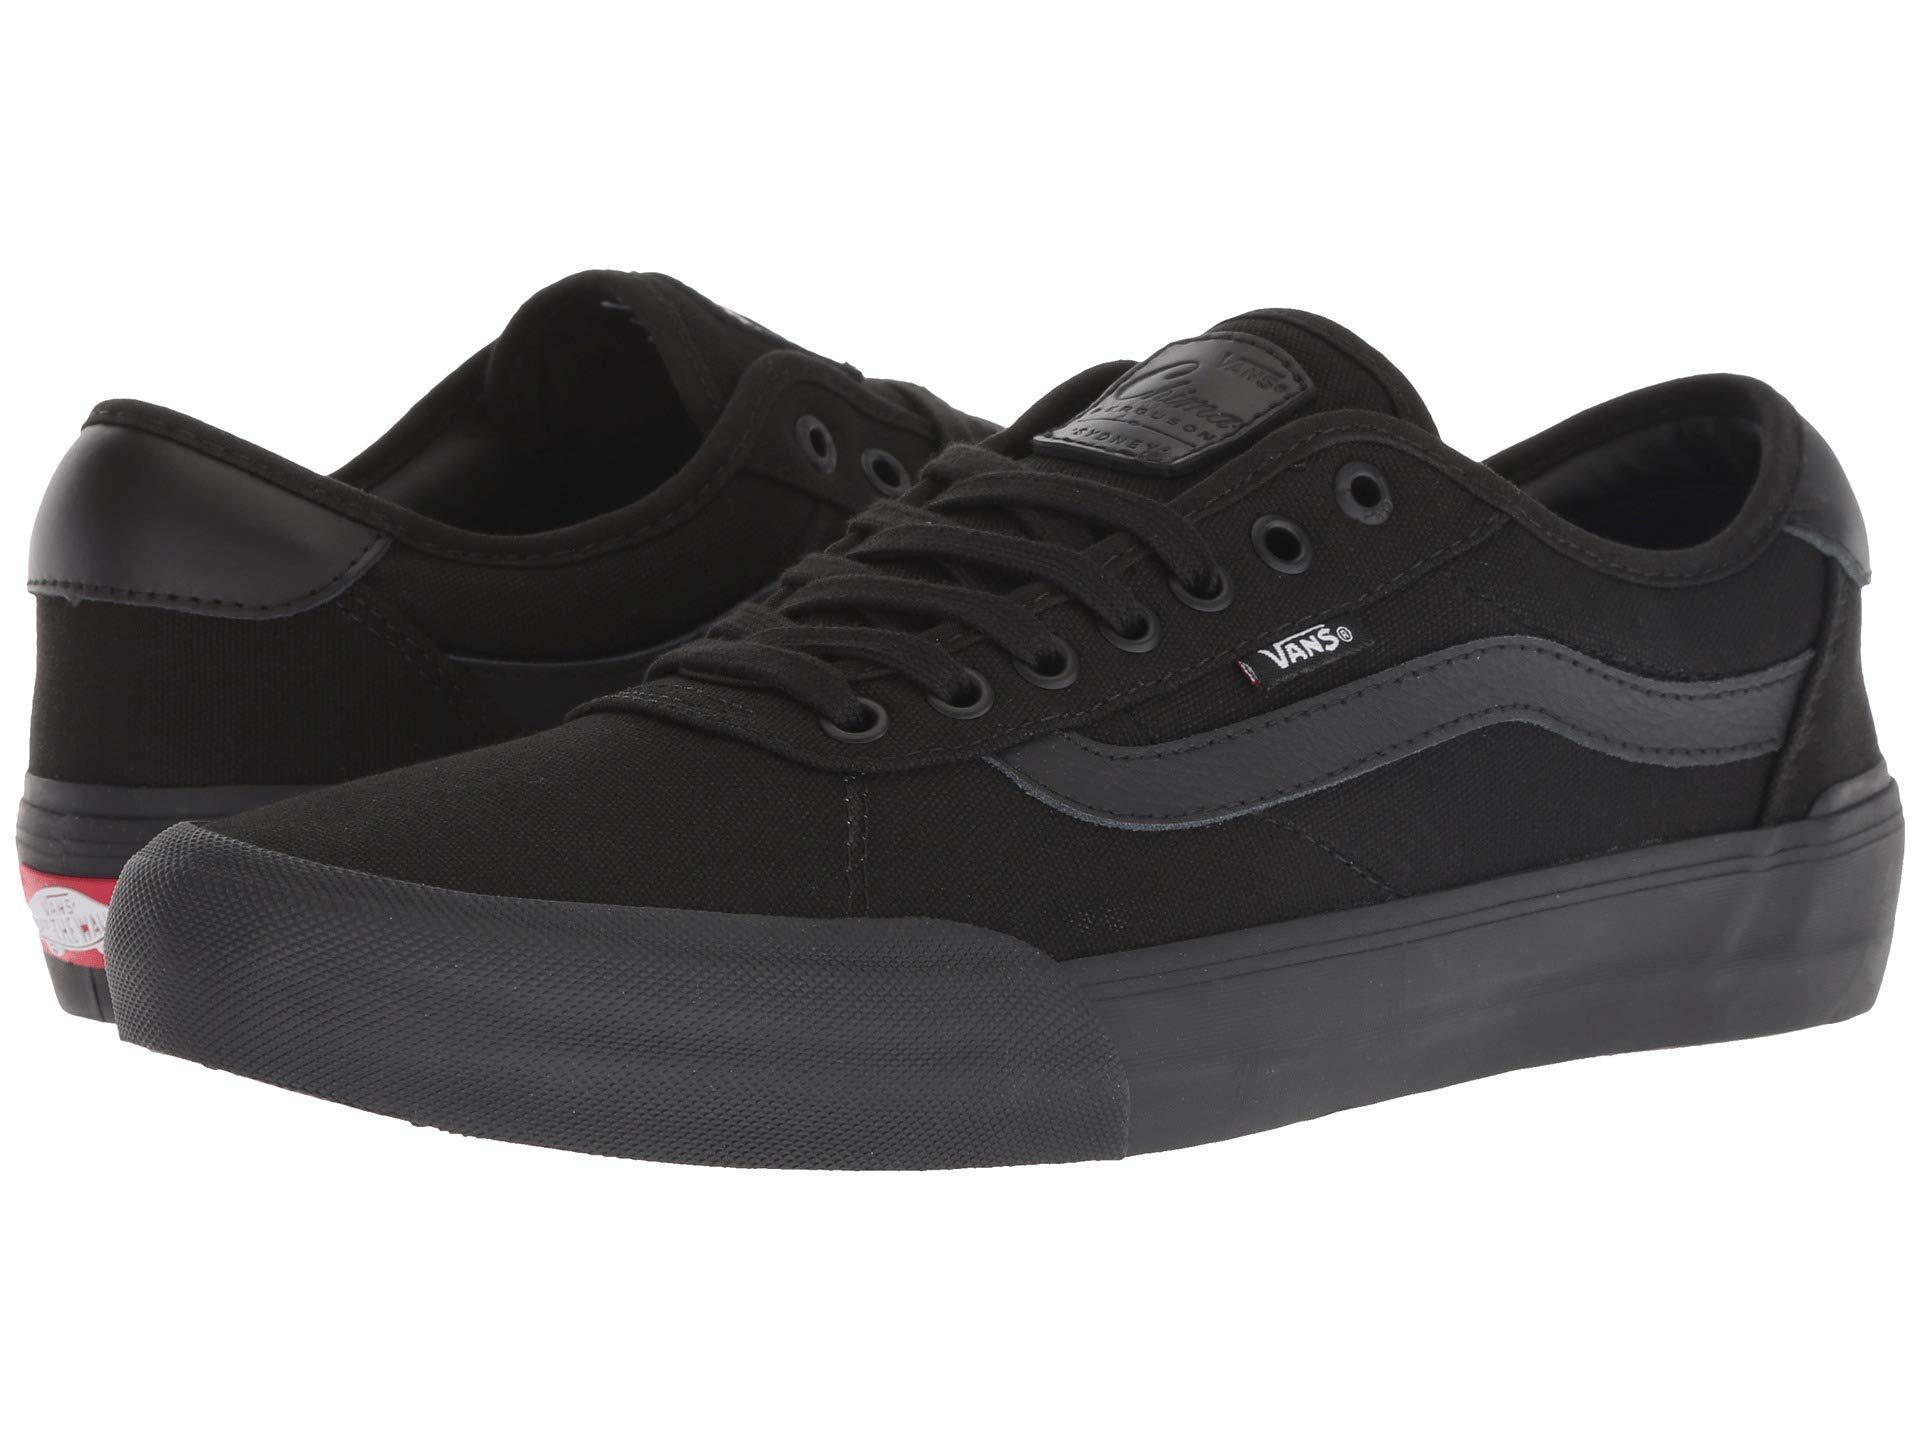 Lyst - Vans Chima Pro 2 ((suede canvas) Black white) Men s Skate ... 031f7c38f